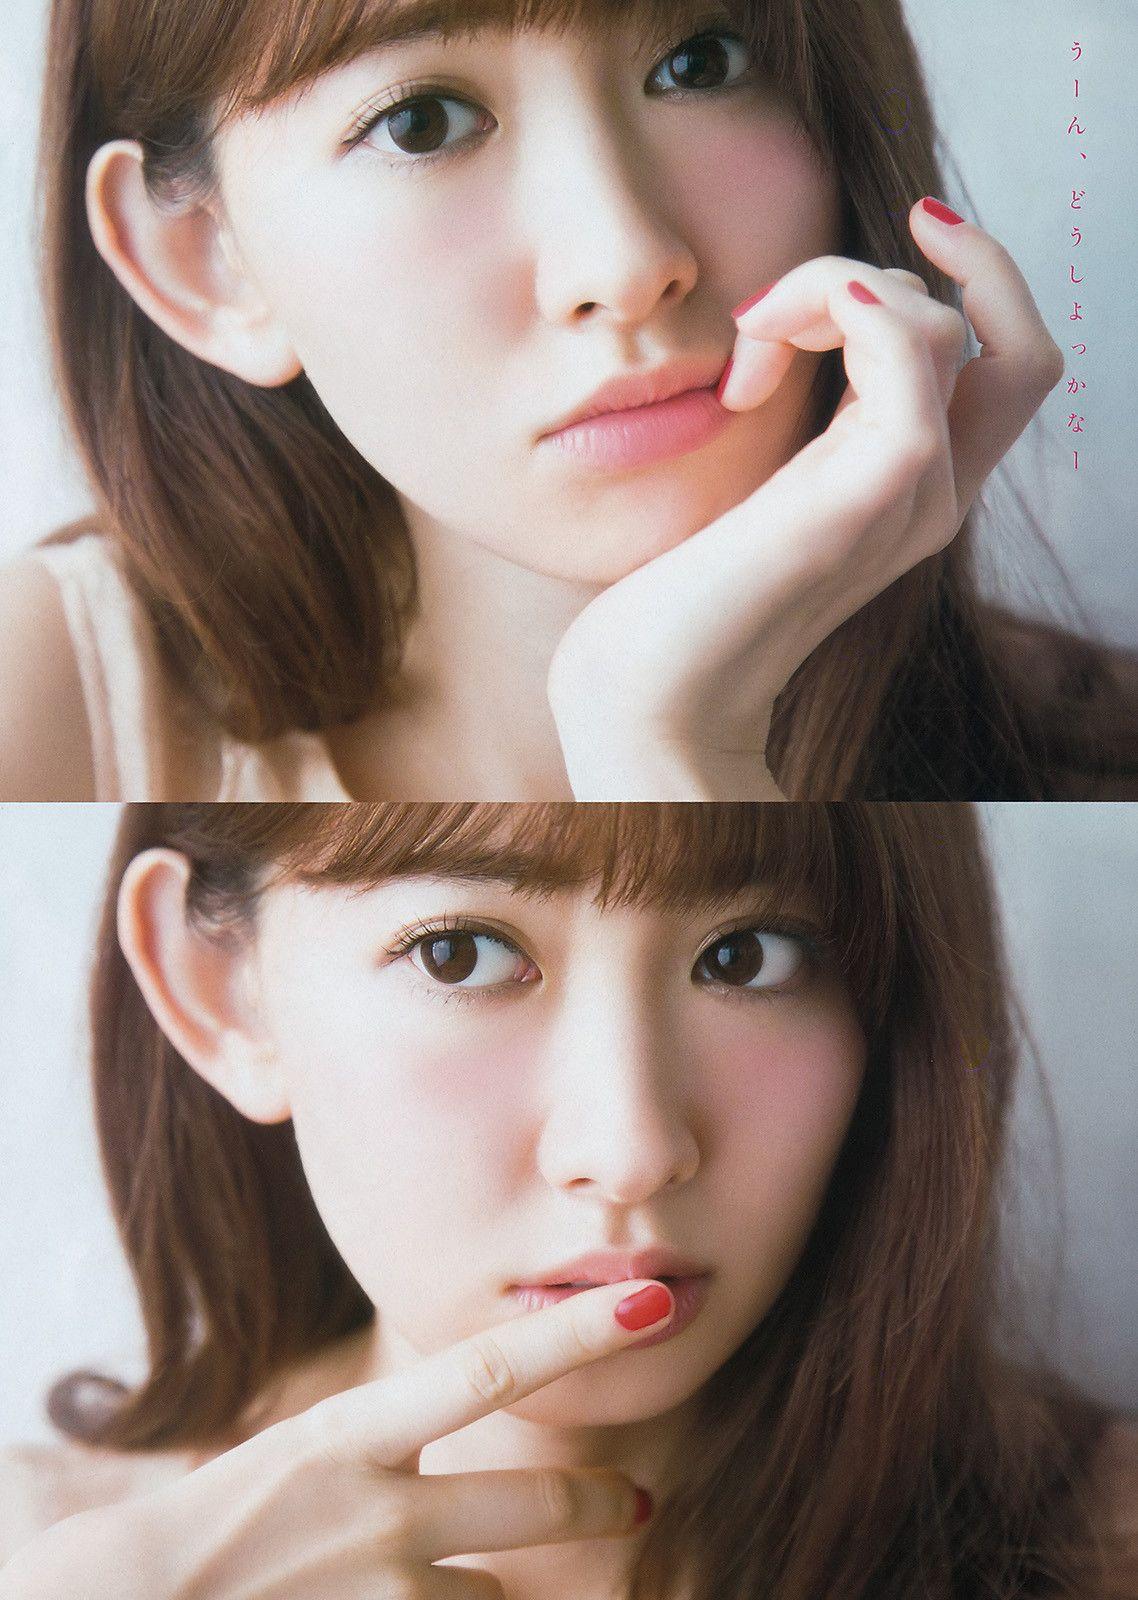 「VOZ48」 — 「Young Jump」 No.13 2017 #乃木坂46 #堀未央奈 | 日本の女の子